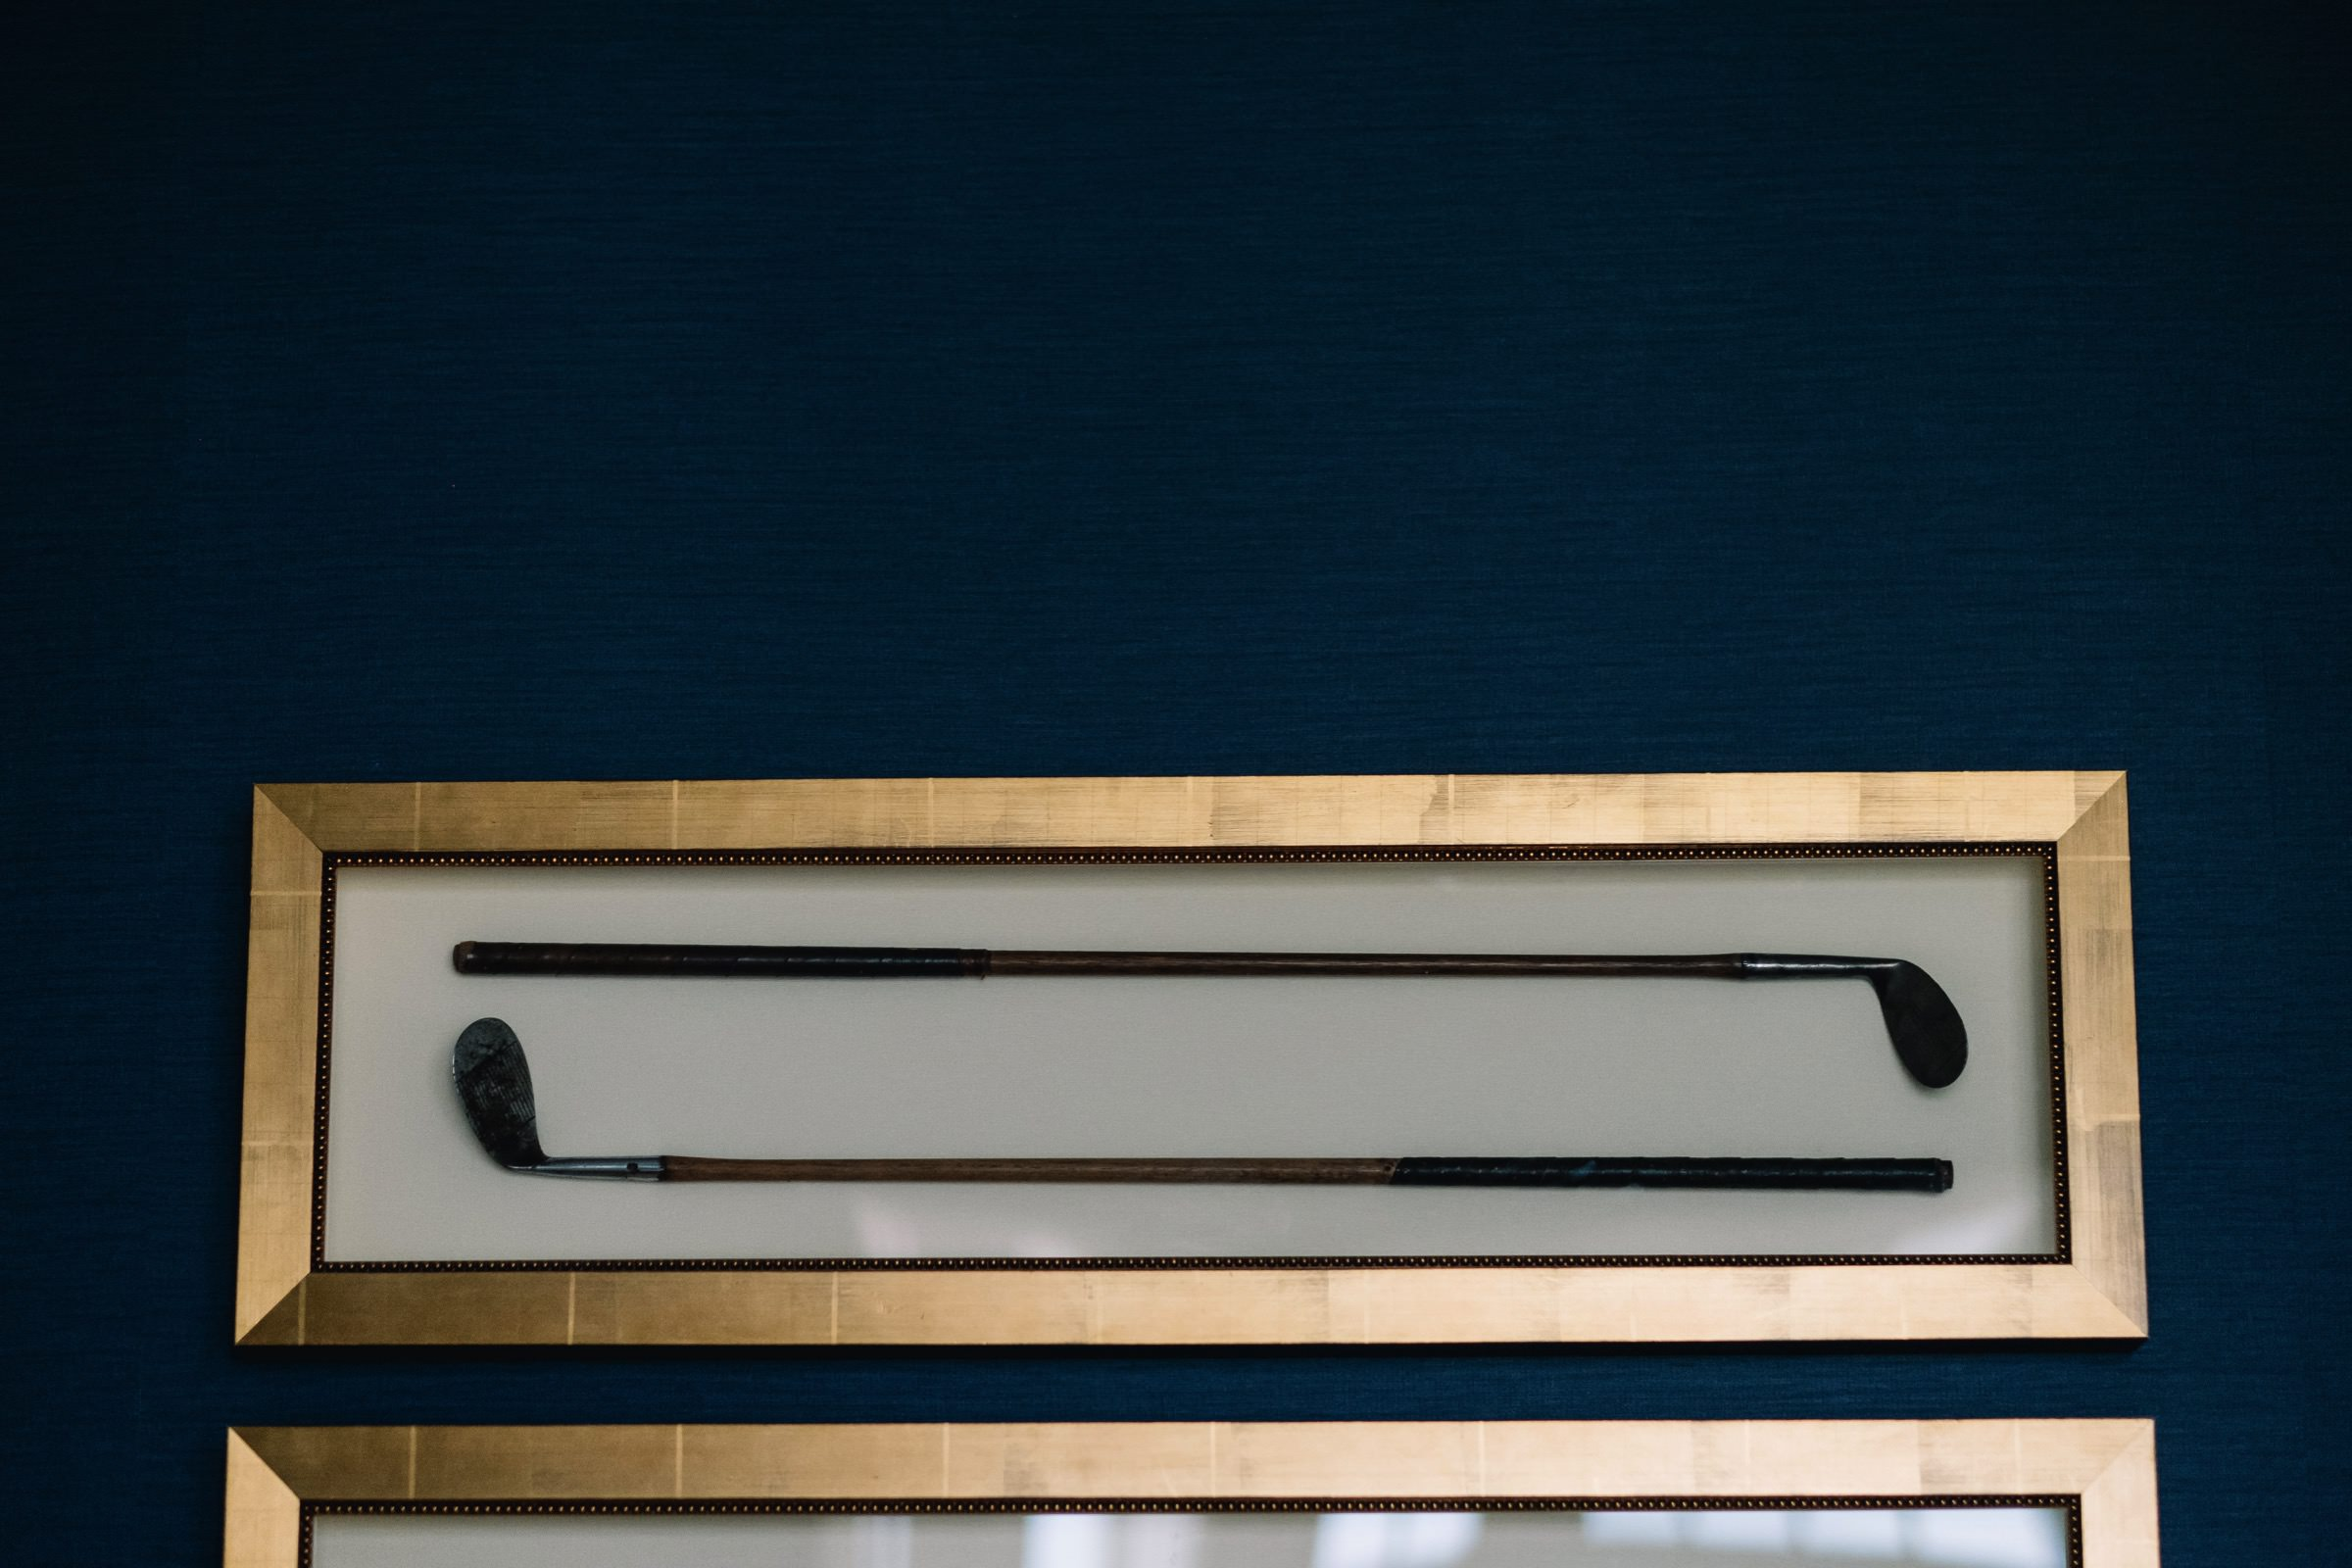 Framed golf clubs